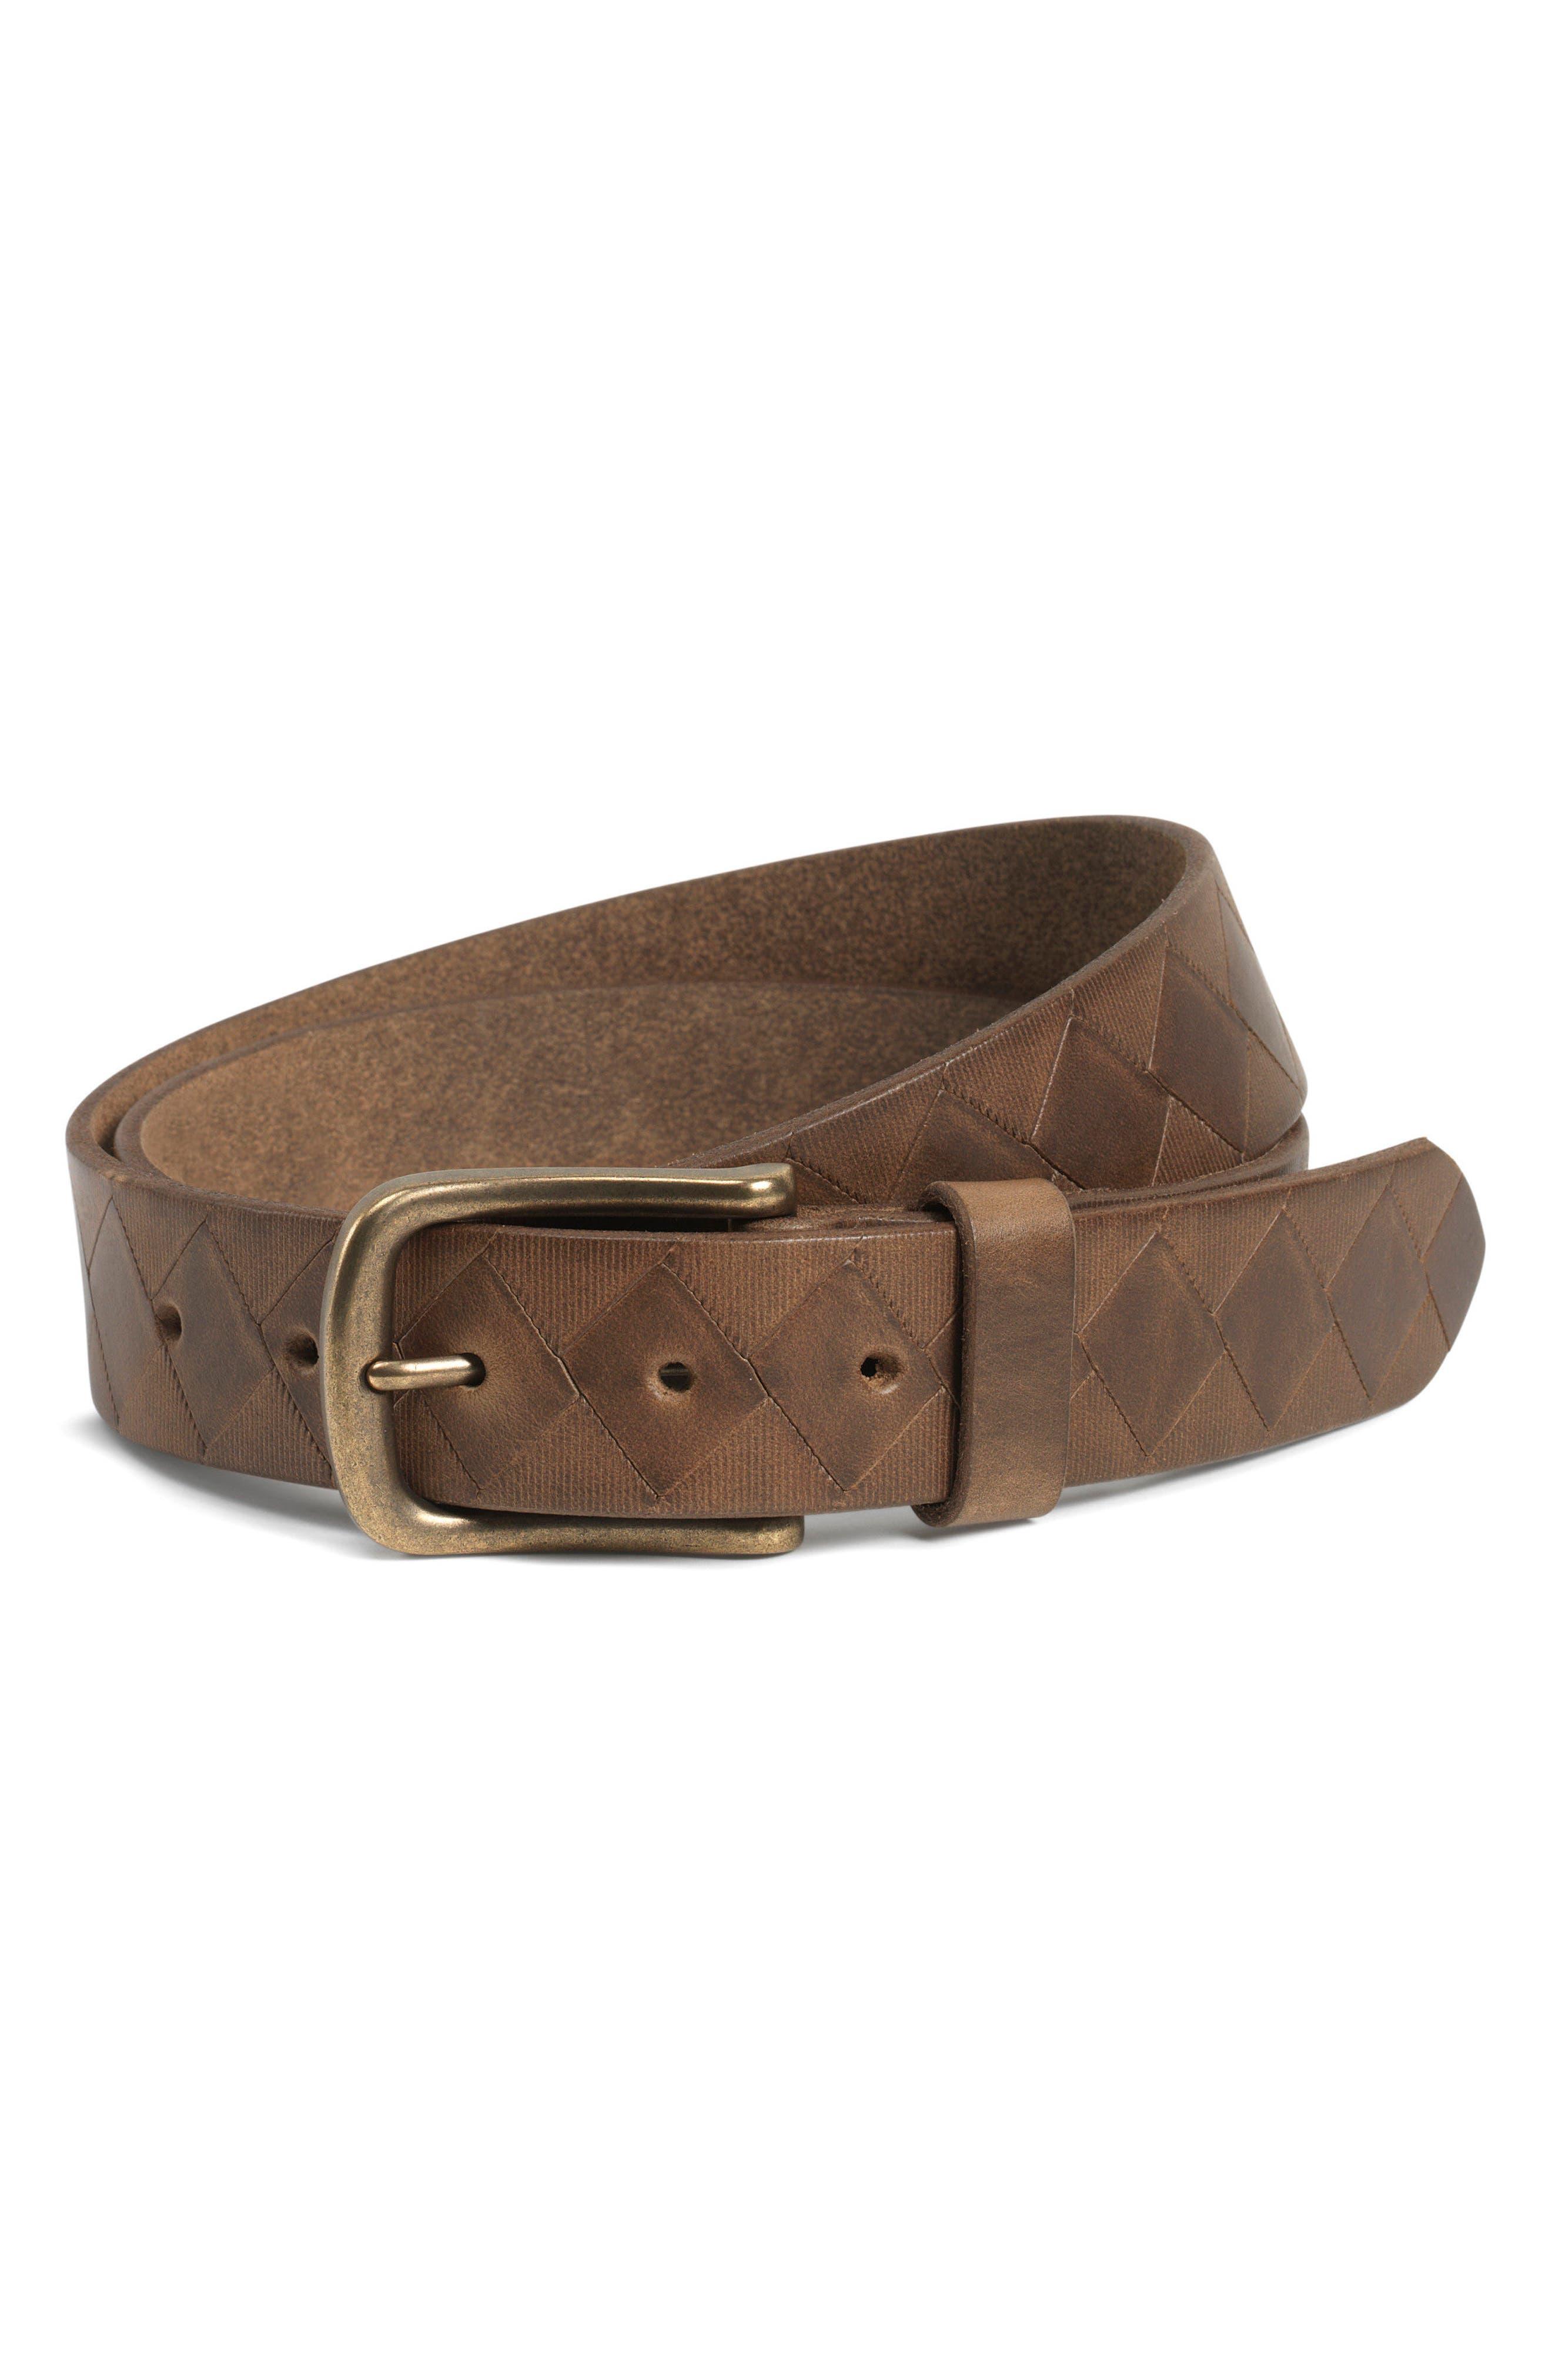 Trask Douglas Leather Belt